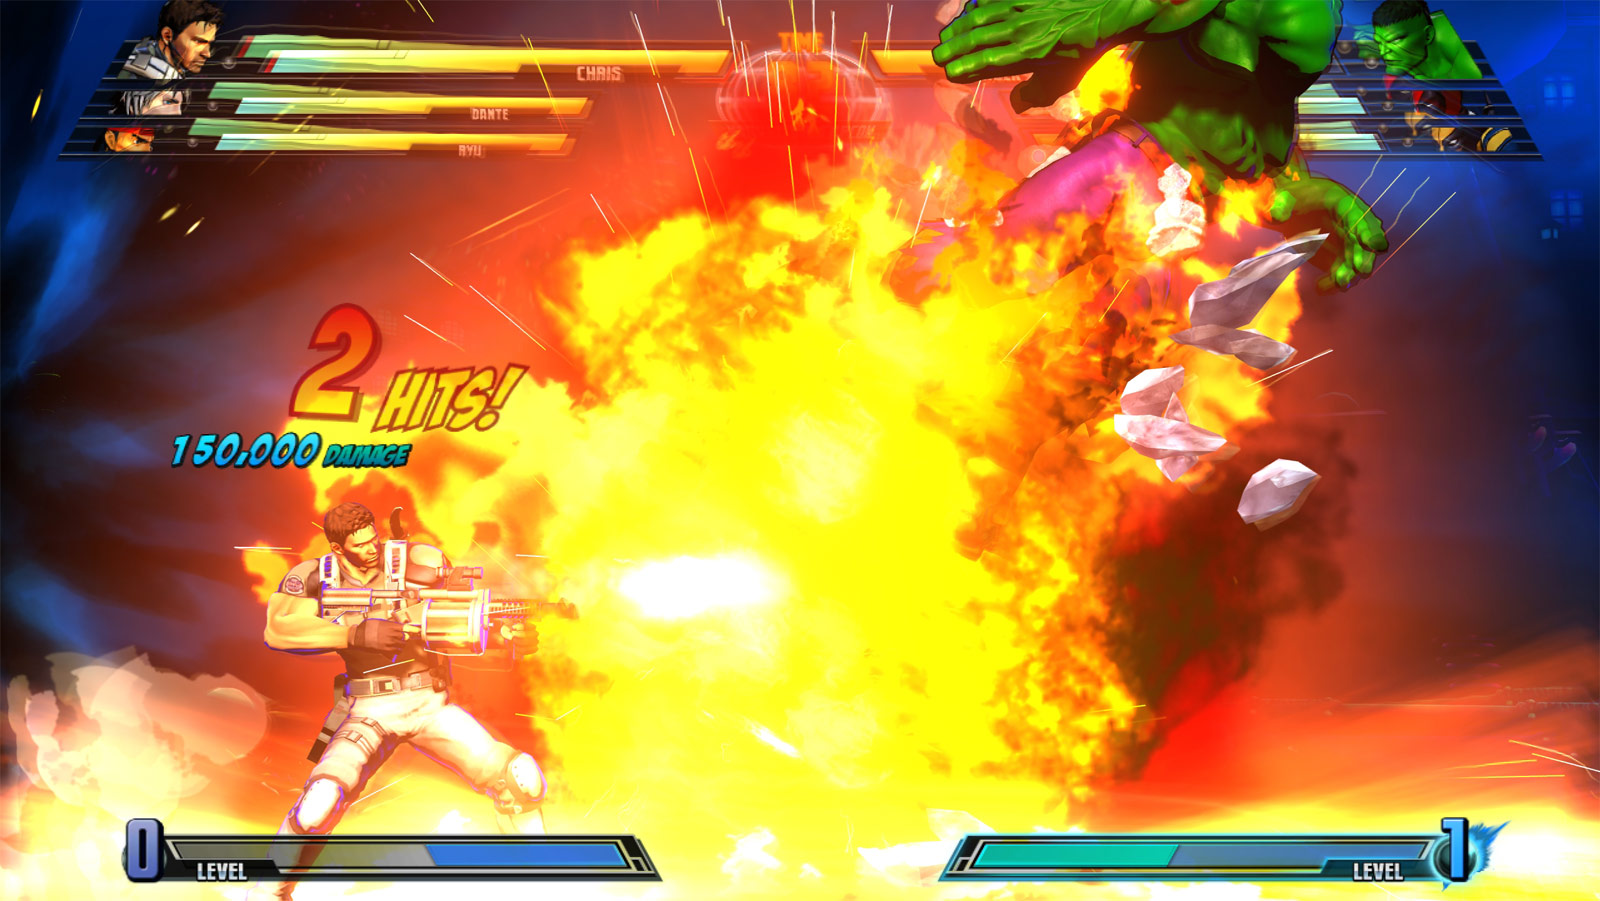 Marvel vs. Capcom 3 screen shot from E3 image #11